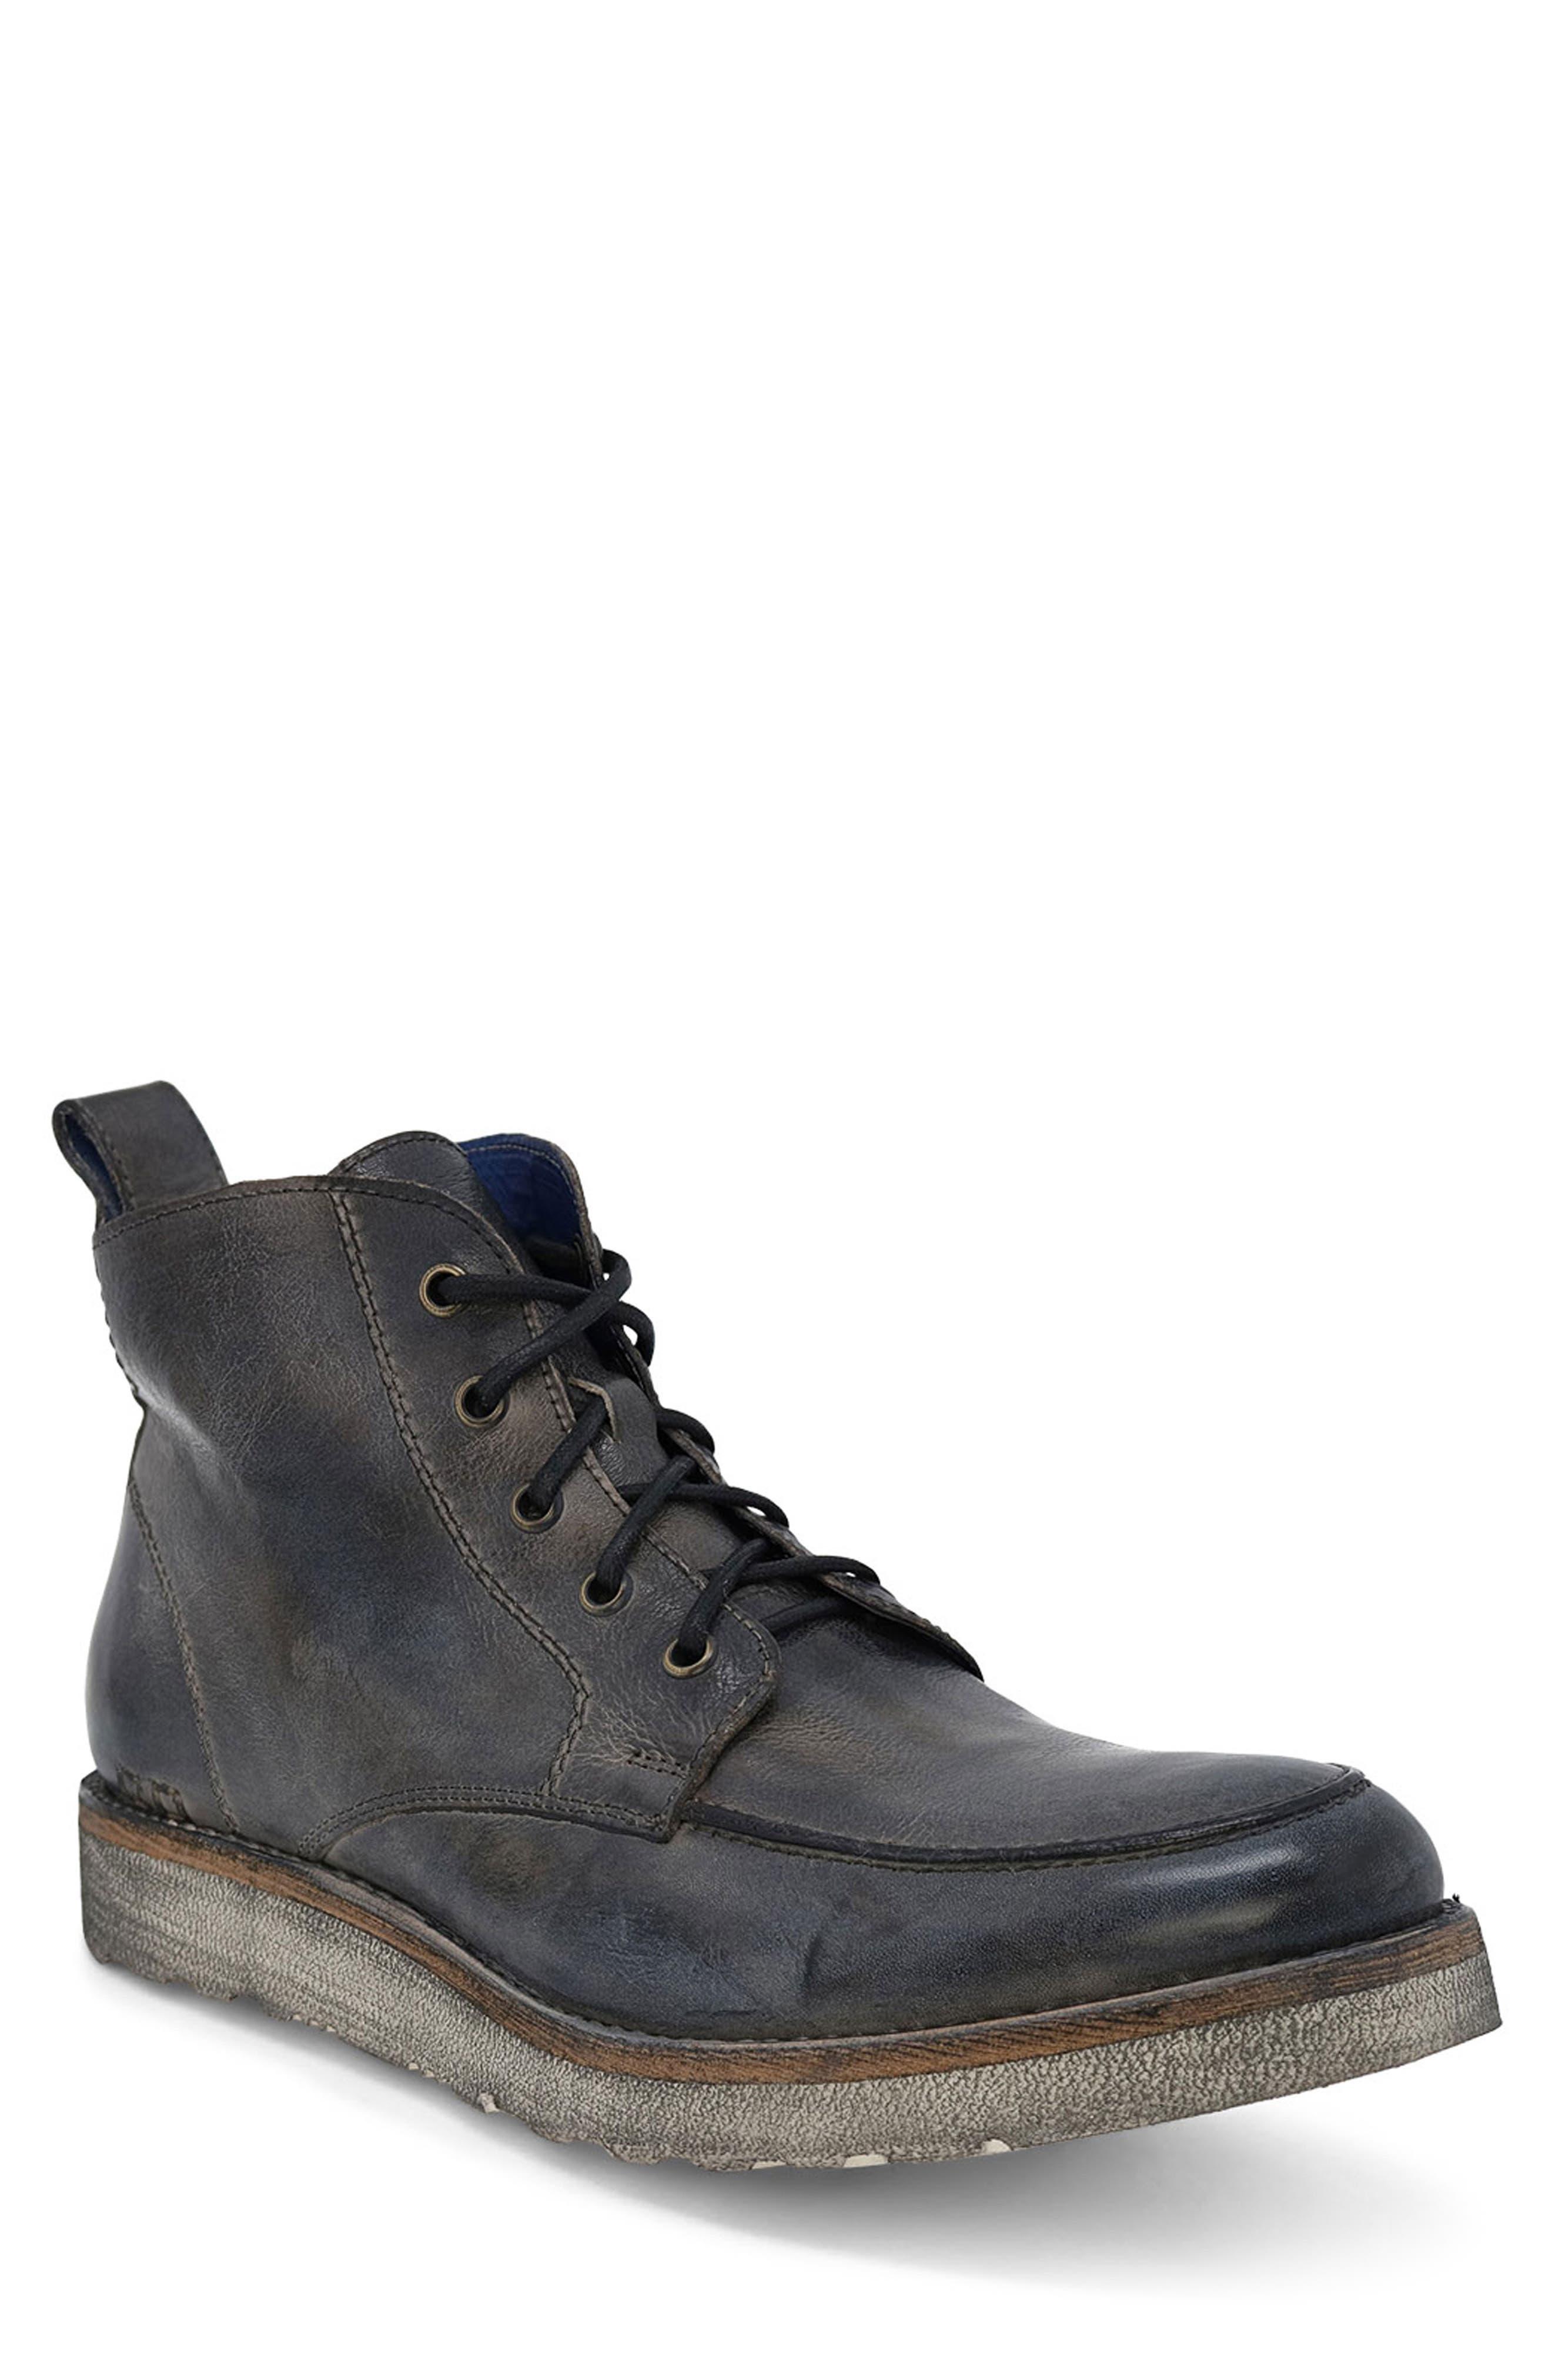 Lincoln Moc Toe Boot